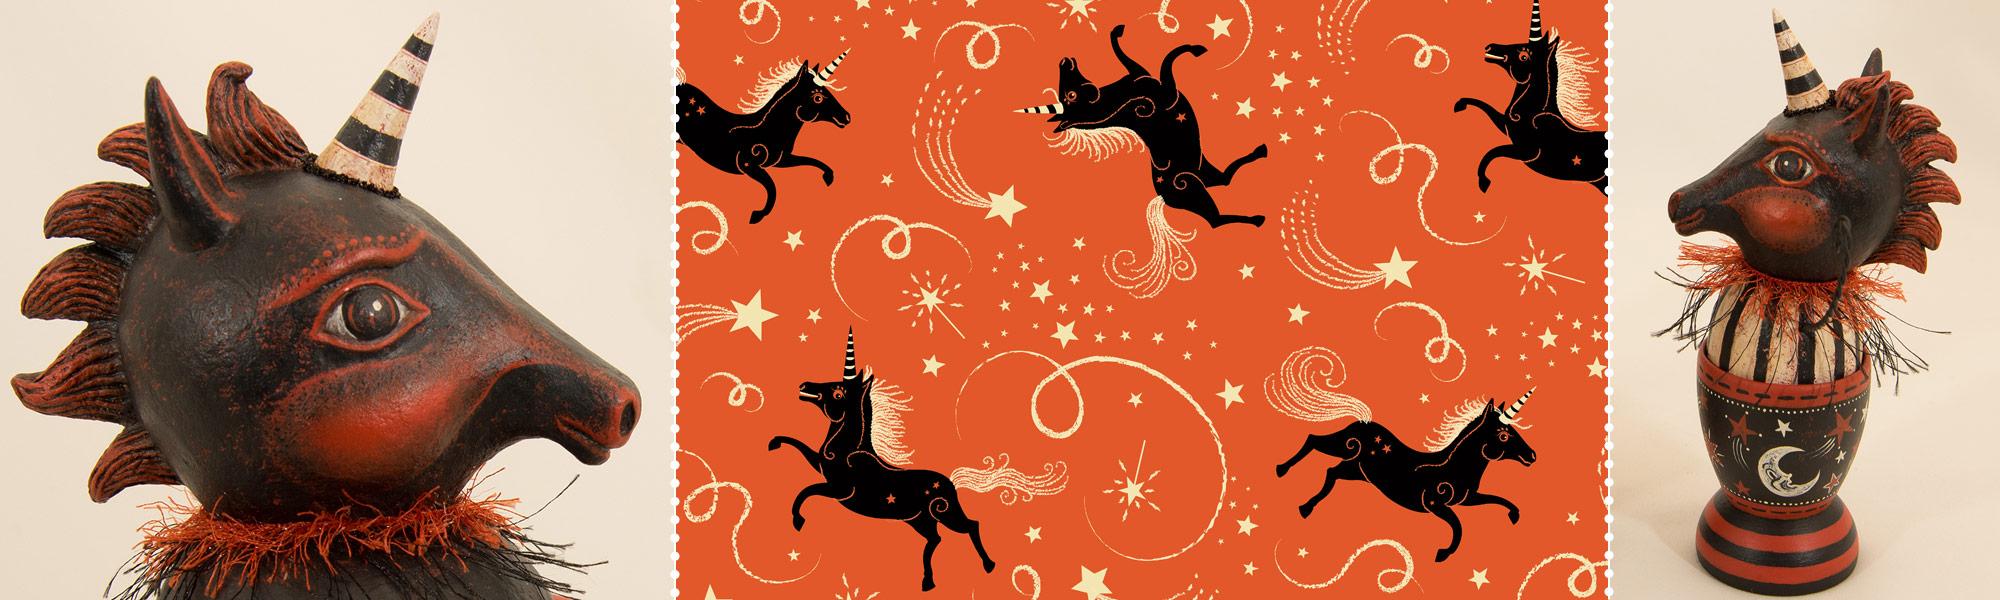 Johanna-Parker-Unicorn-Halloween-Banner.jpg